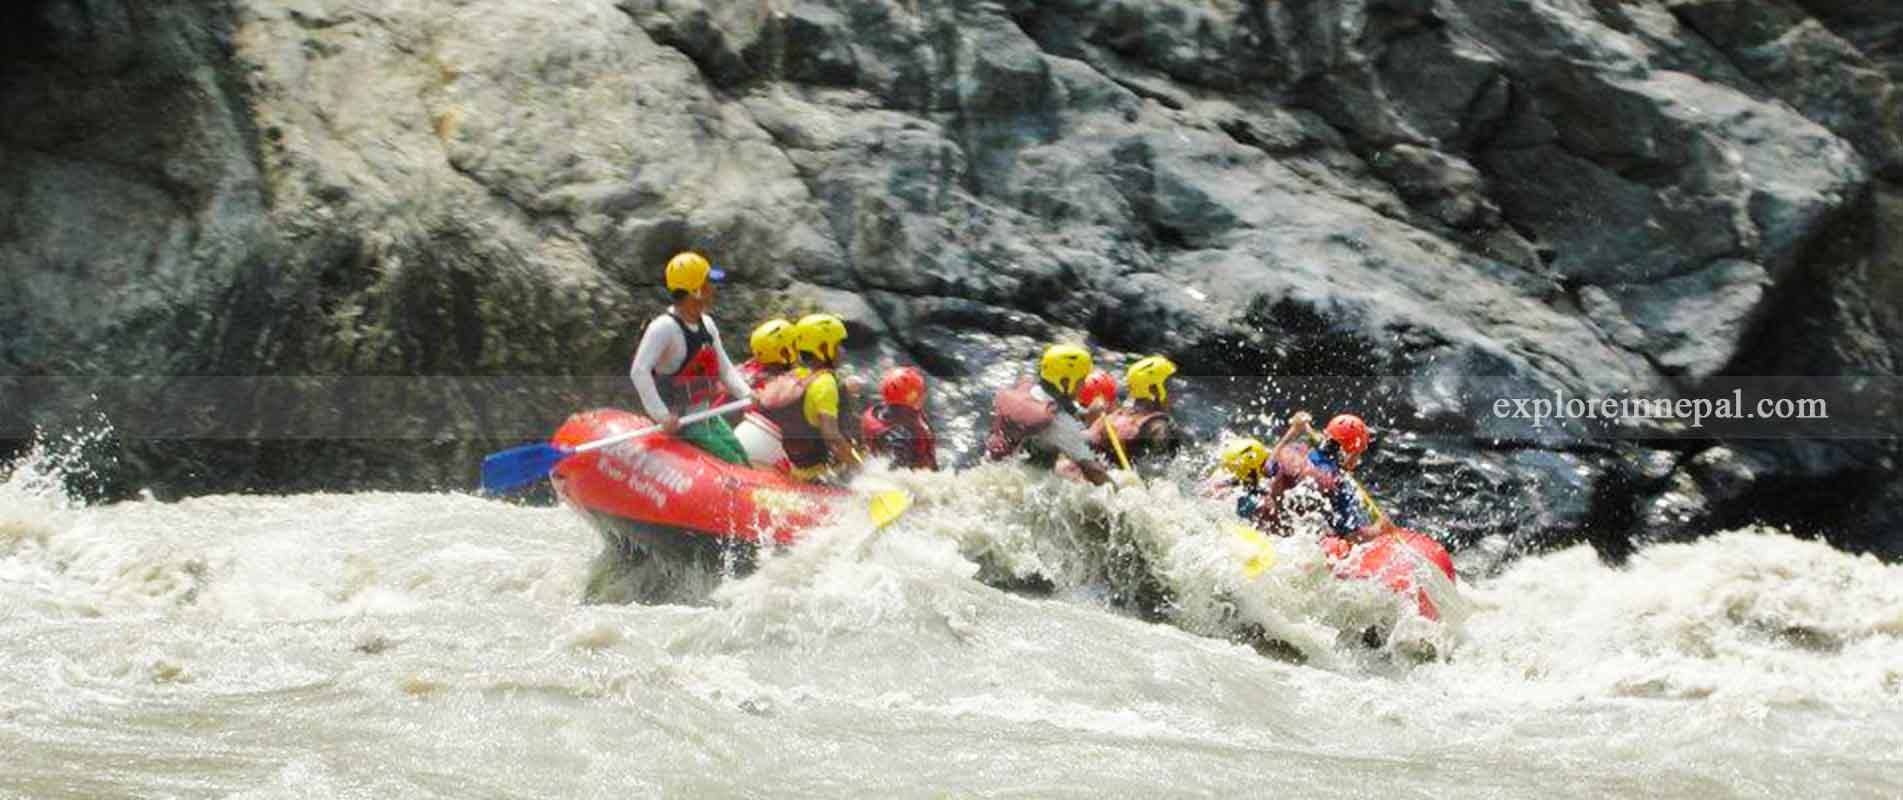 trisuli day tour raftting